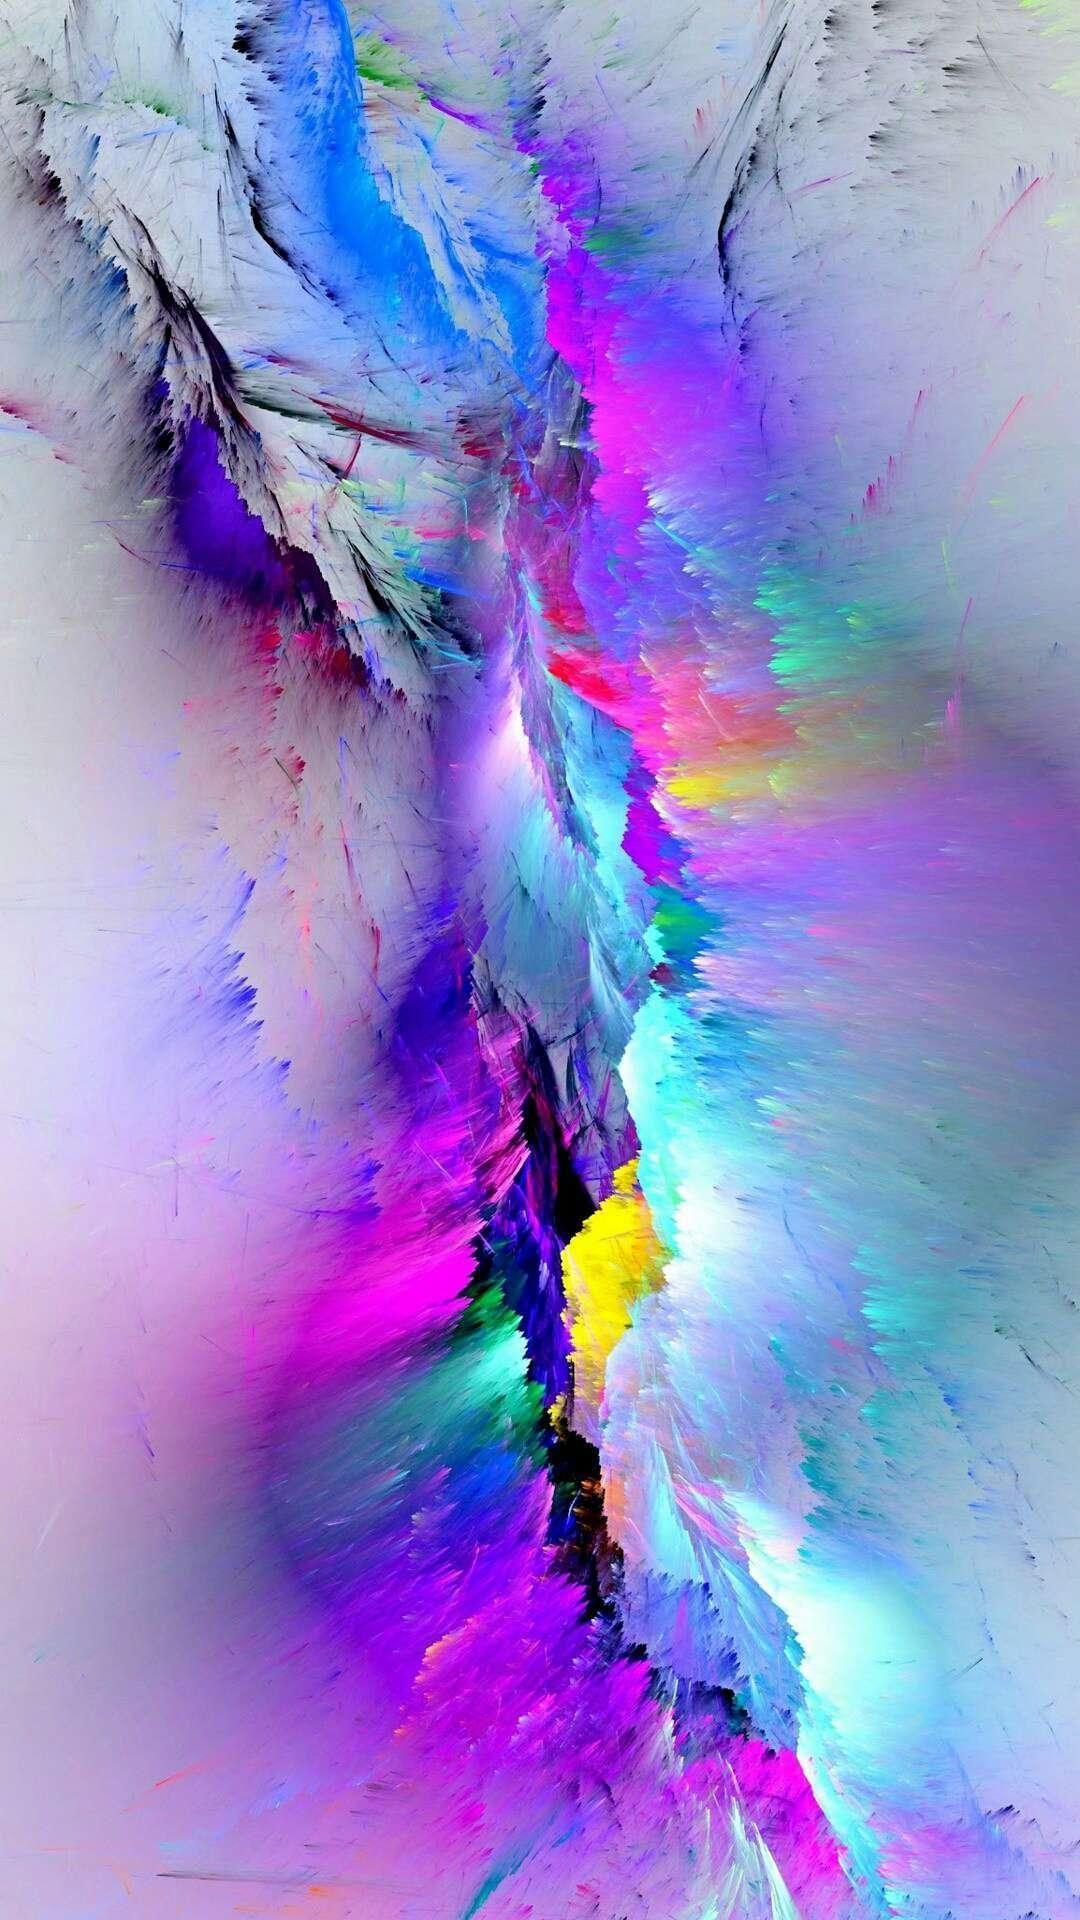 Instagram Marketing Websolutionsz Com Abstract Iphone Wallpaper Motion Wallpapers Rainbow Wallpaper